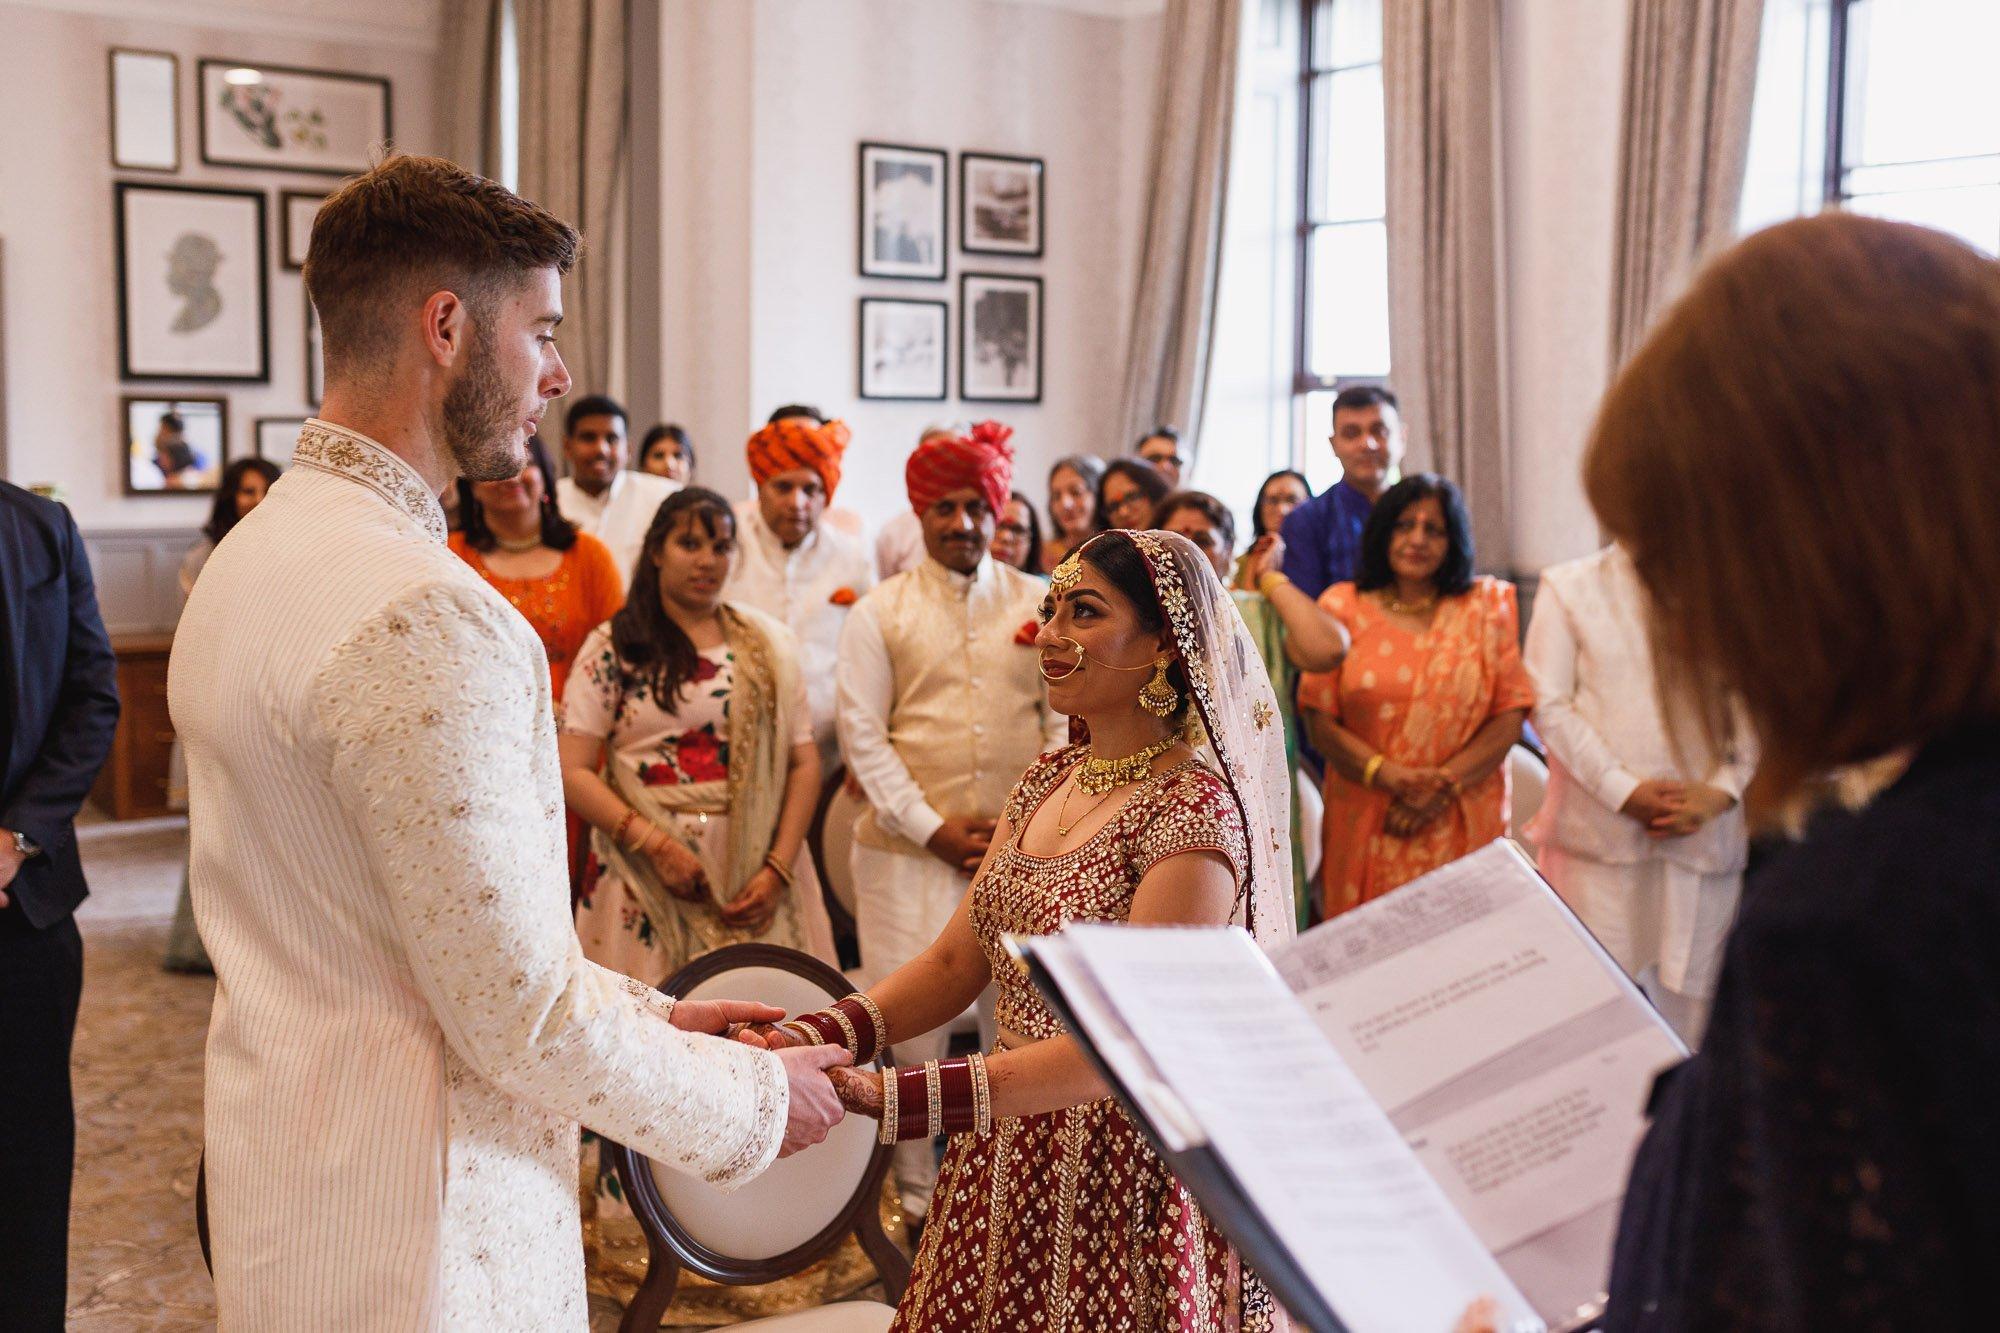 De Vere Wokefield Estate, Asian wedding photographer, civil ceremony